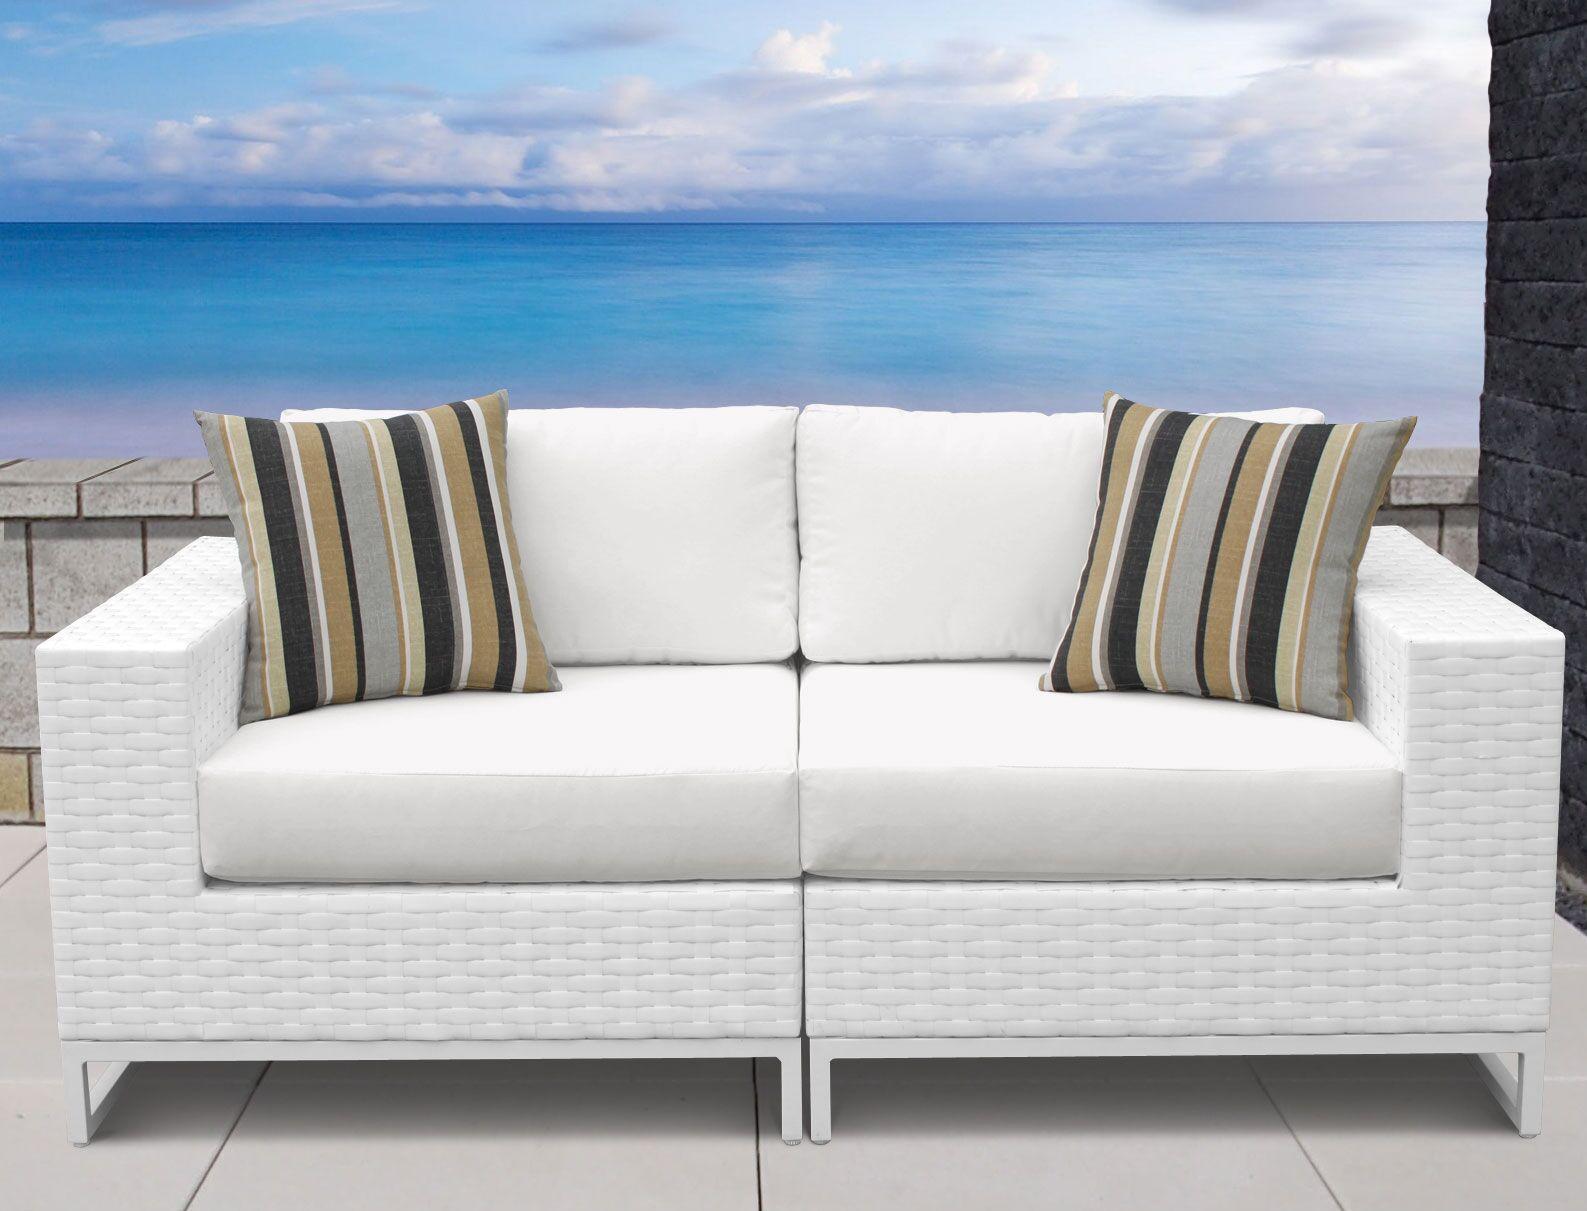 Miami 2 Piece Sofa Set with Cushions Fabric: White